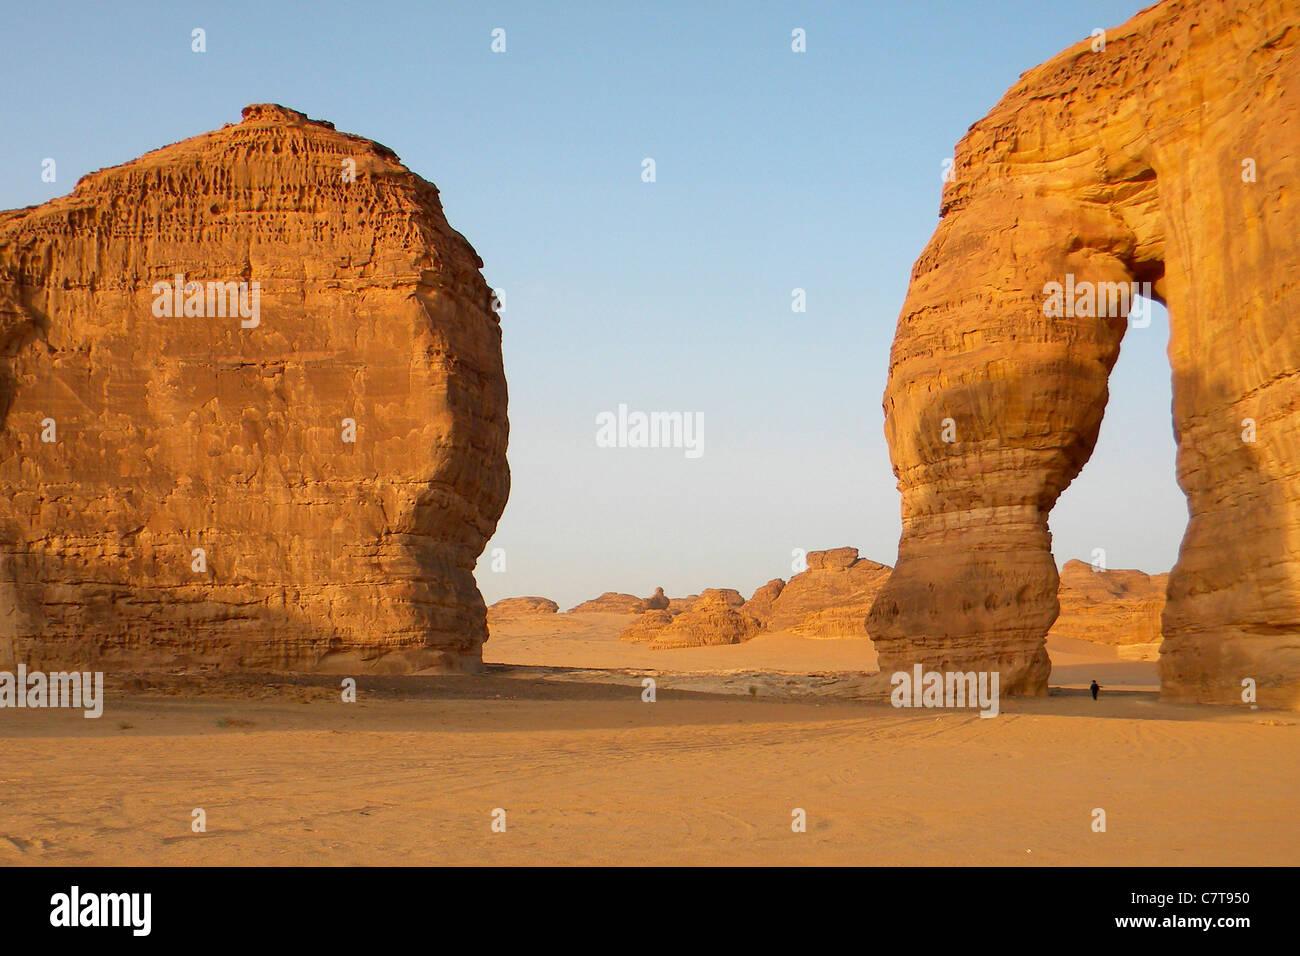 Saudi Arabia, Al Ula the elephant rock - Stock Image